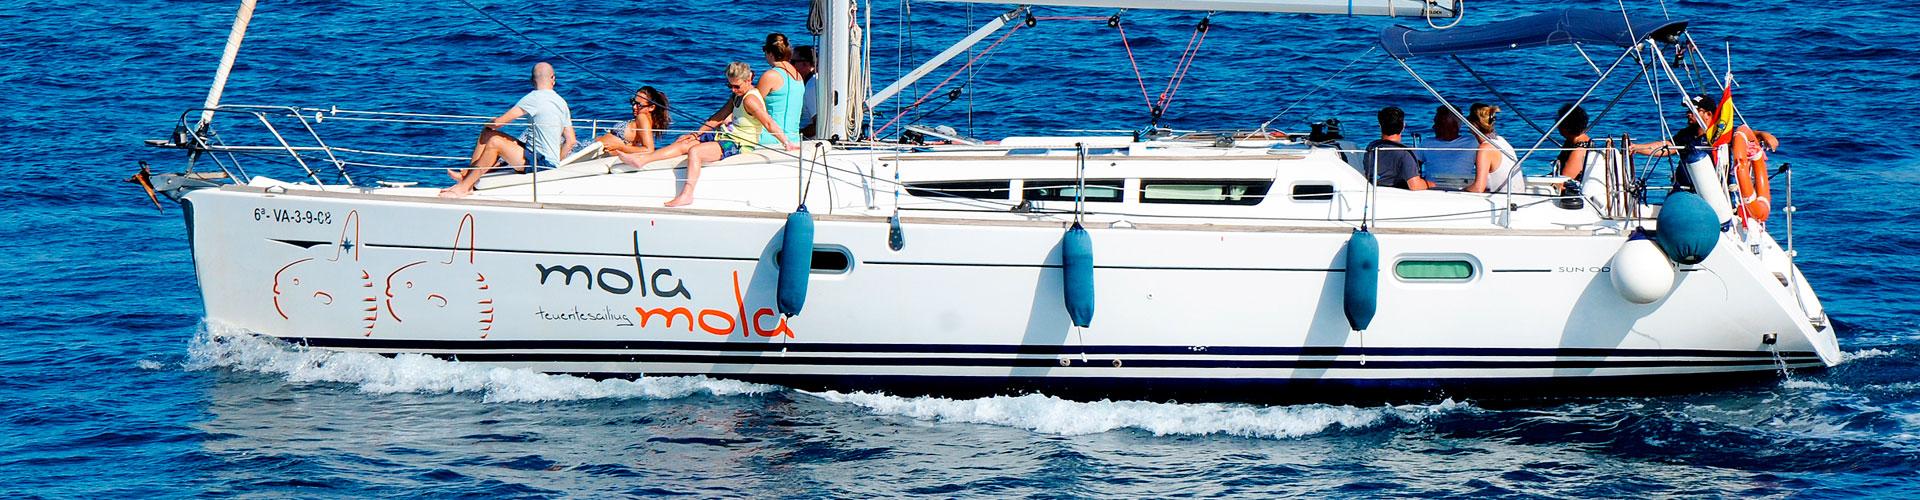 Zeilboot Mola Mola